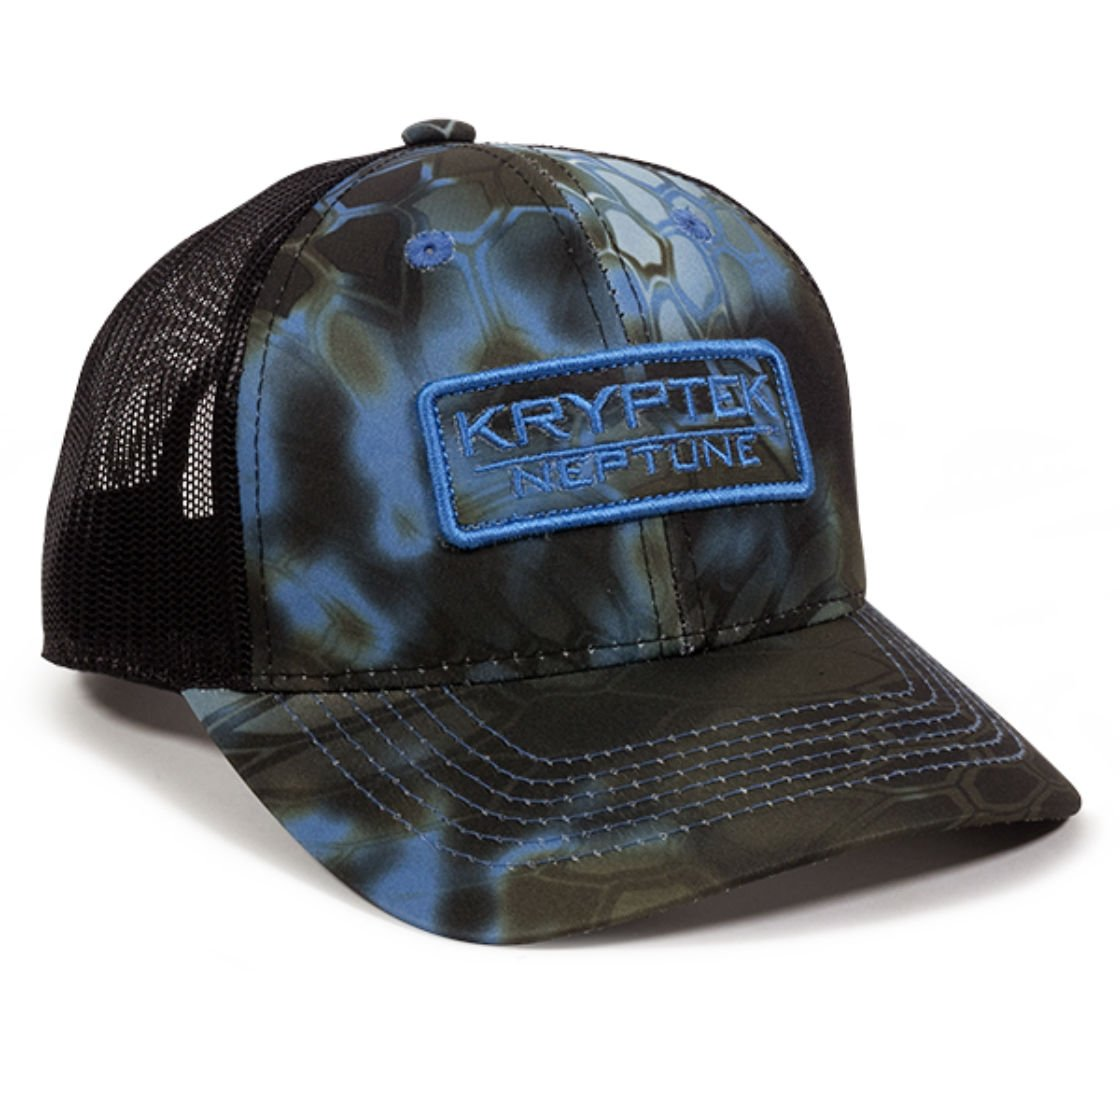 Hunting Kryptek Scout Patch Mesh Back Fishing Military Cap